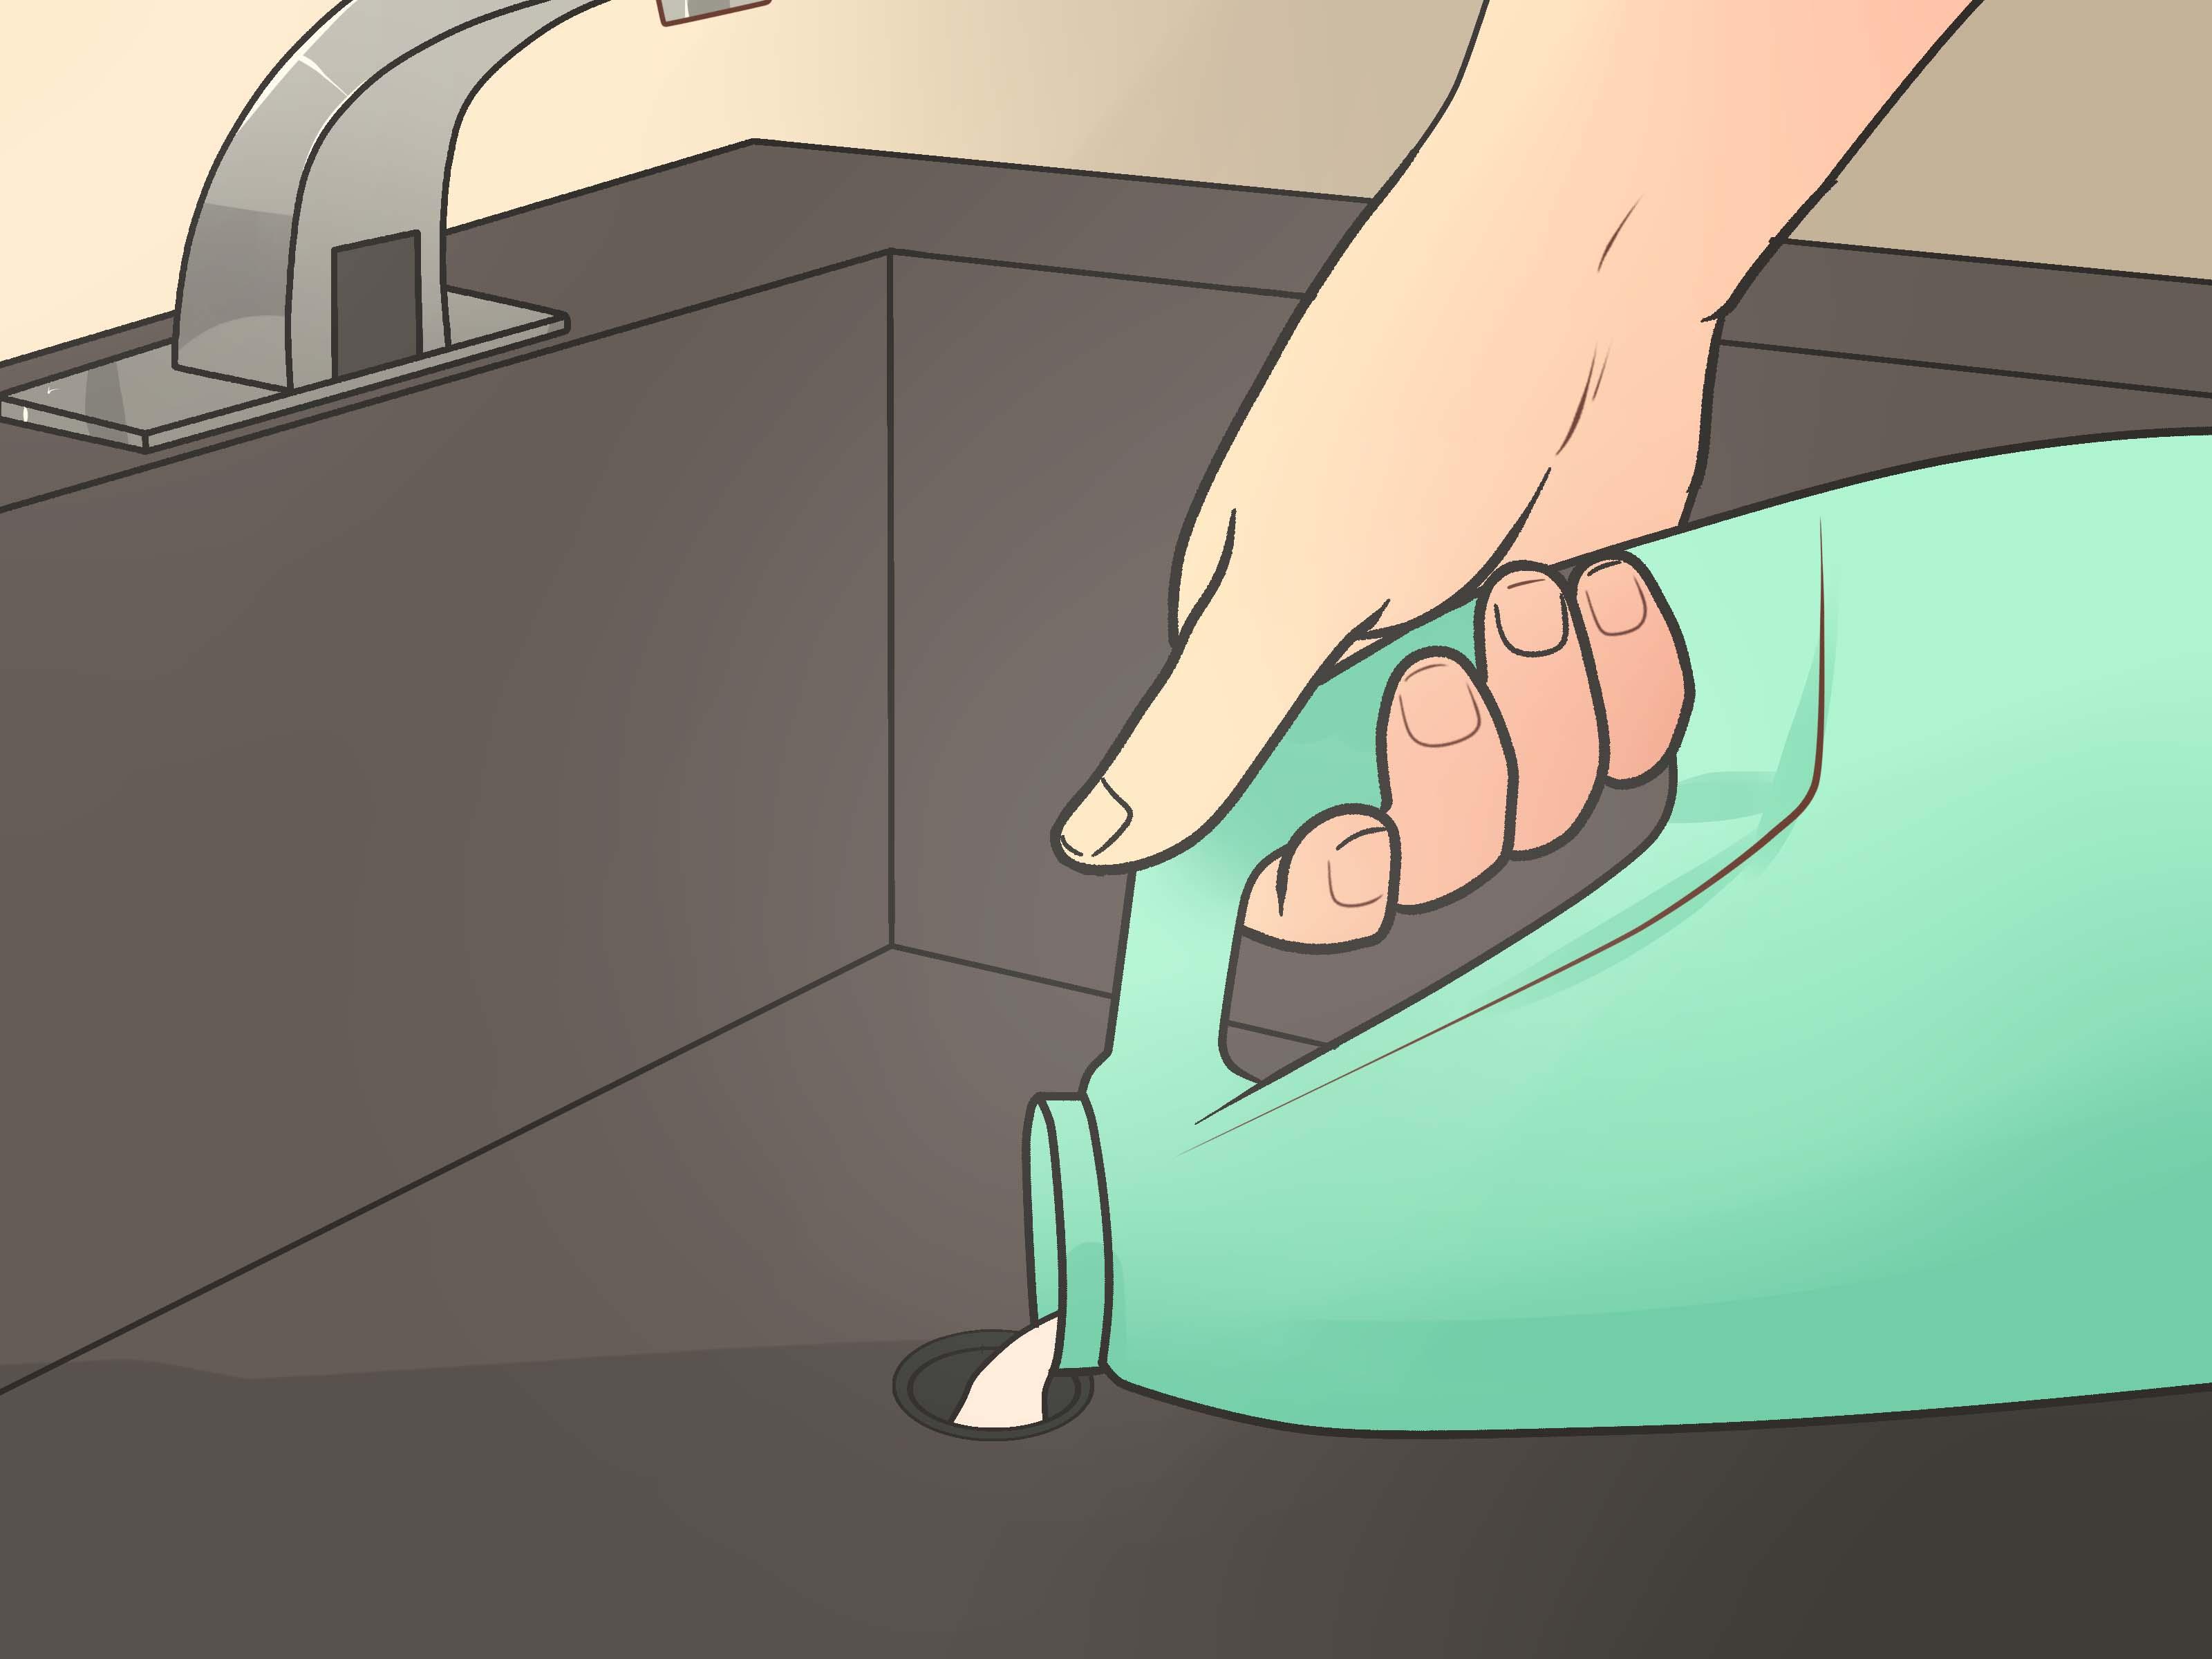 Unclog a Kitchen Sink unclog kitchen sink Unclog a Sink